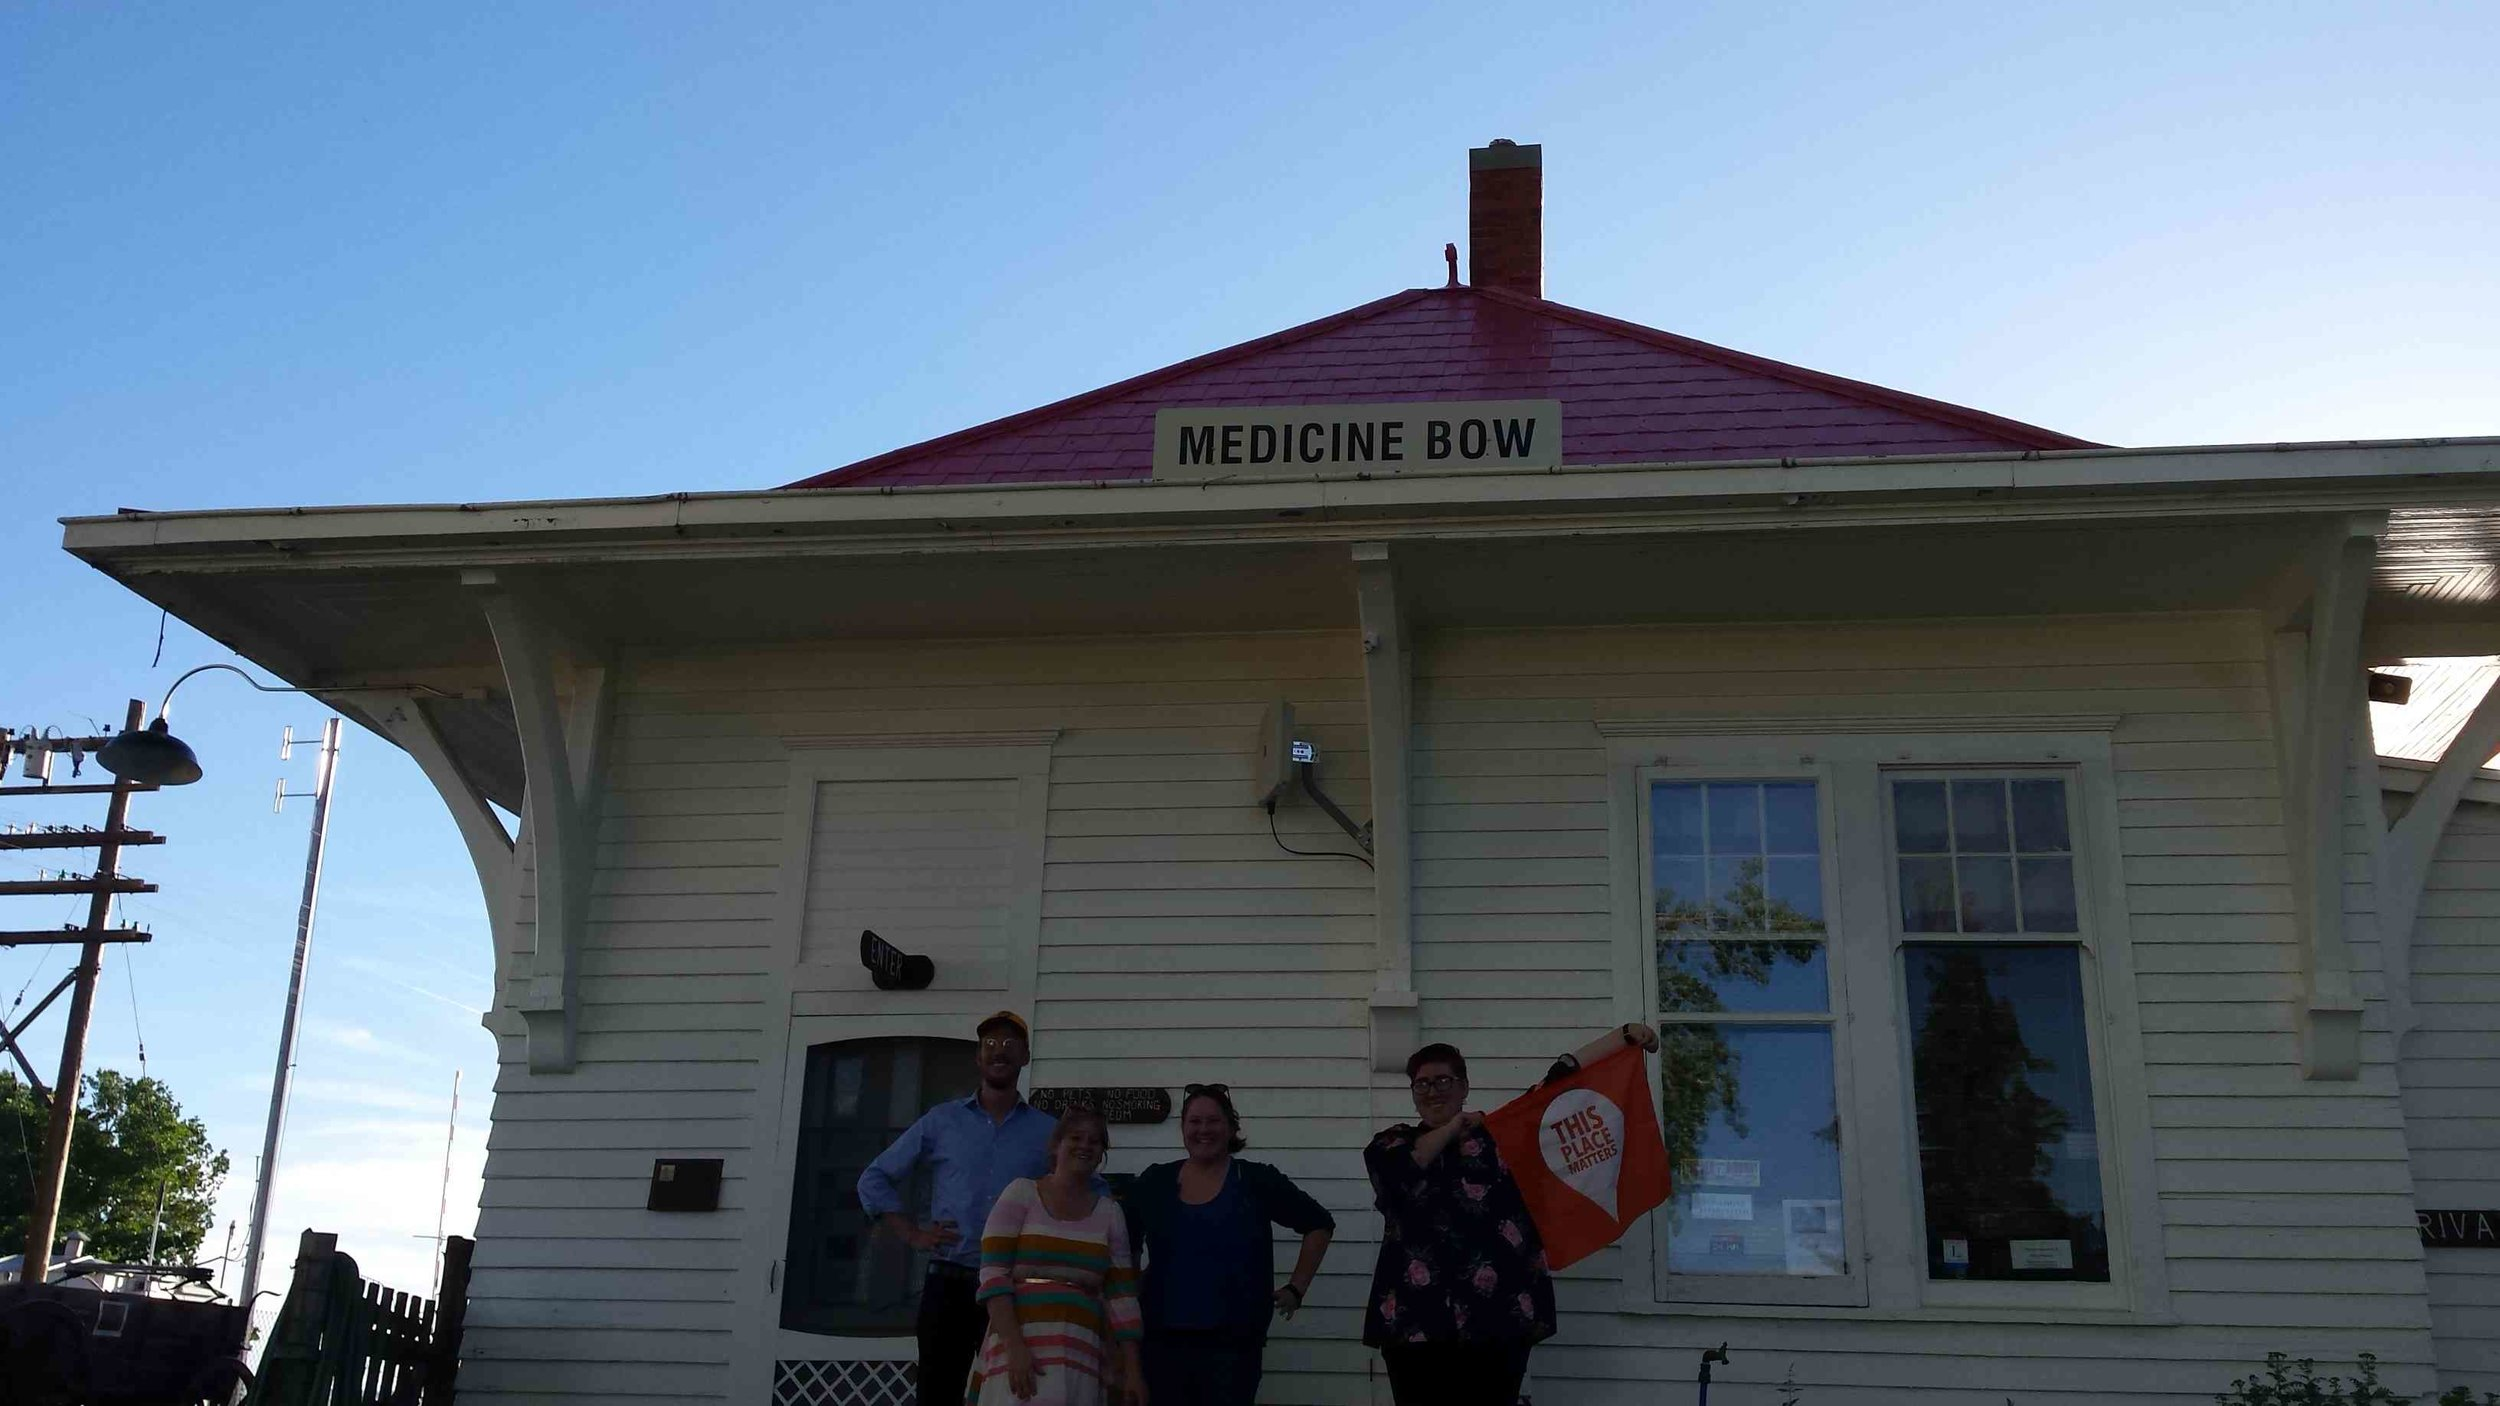 Medicine Bow Depot